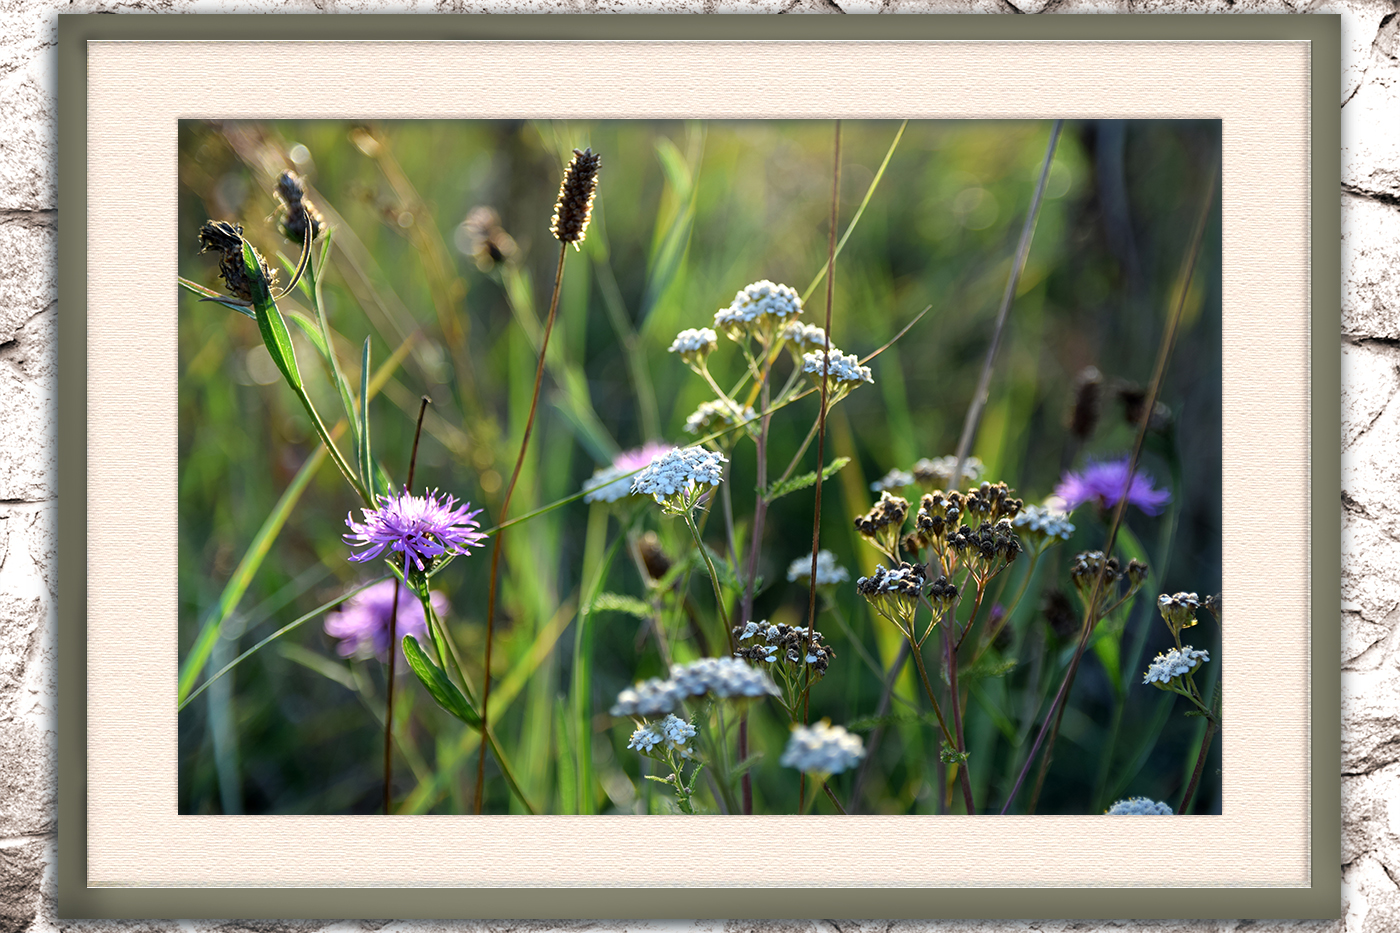 Nature photo, landscape photo, floral photo, summer photo, example image 4